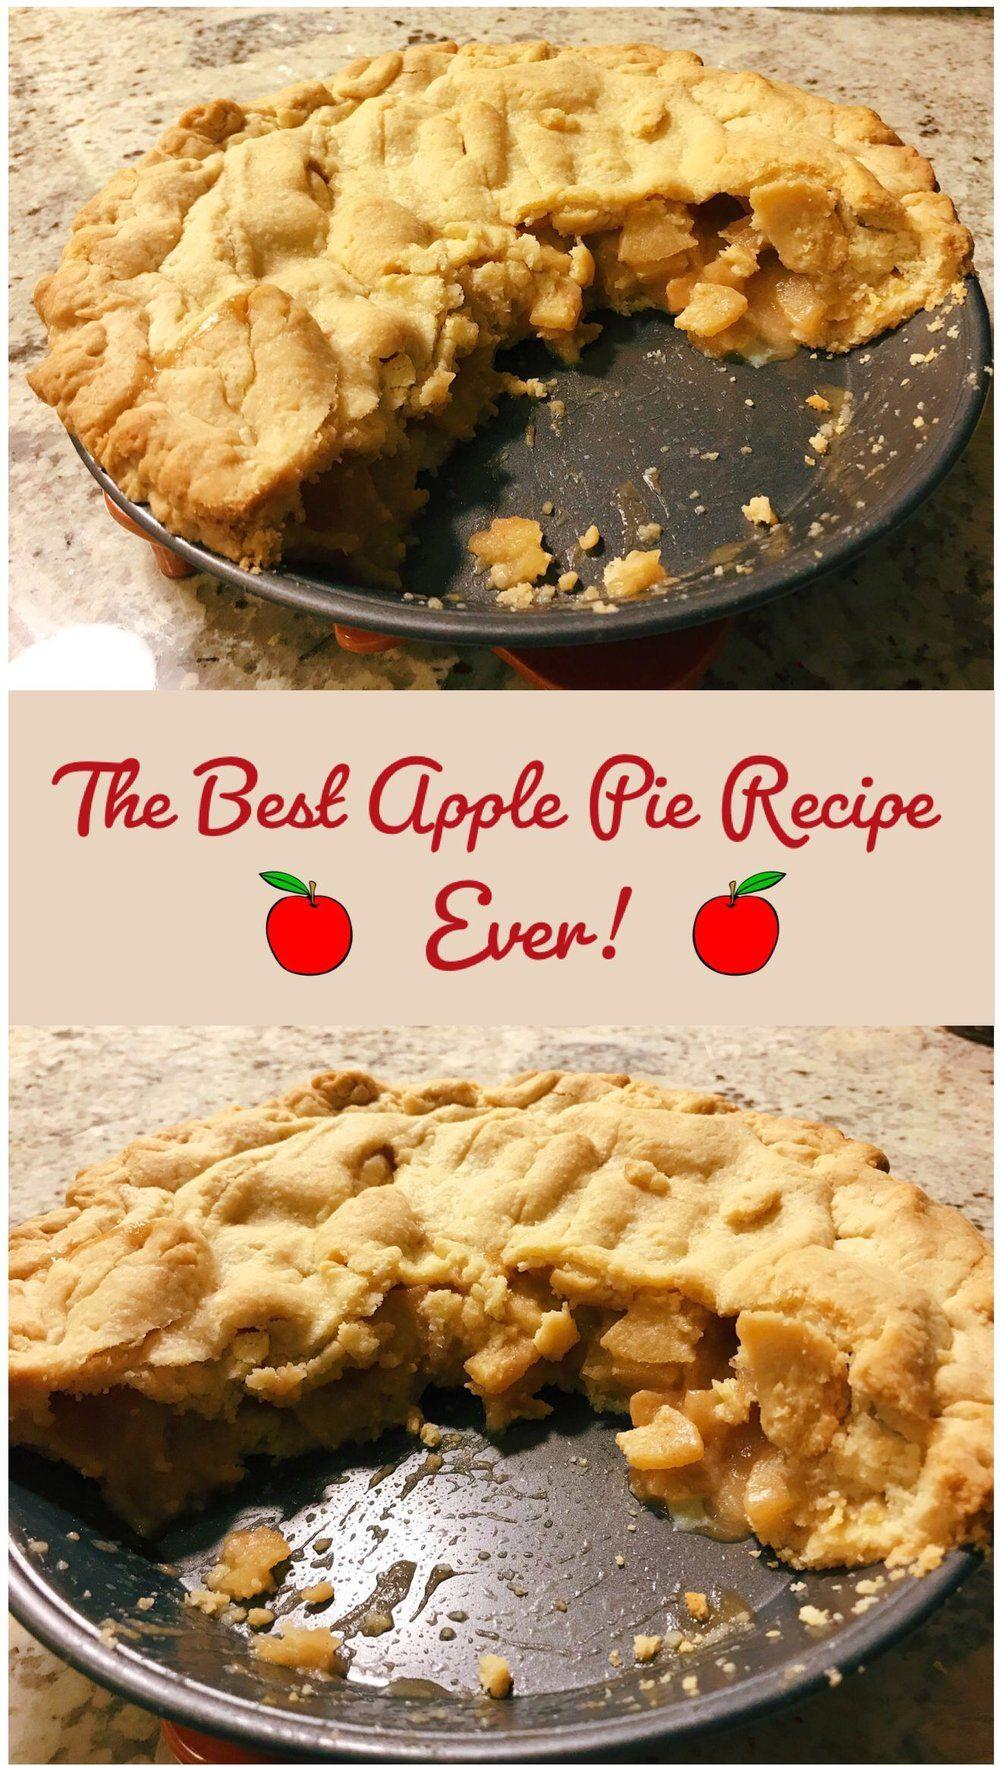 The Best Apple Pie Recipe — All That Glitters